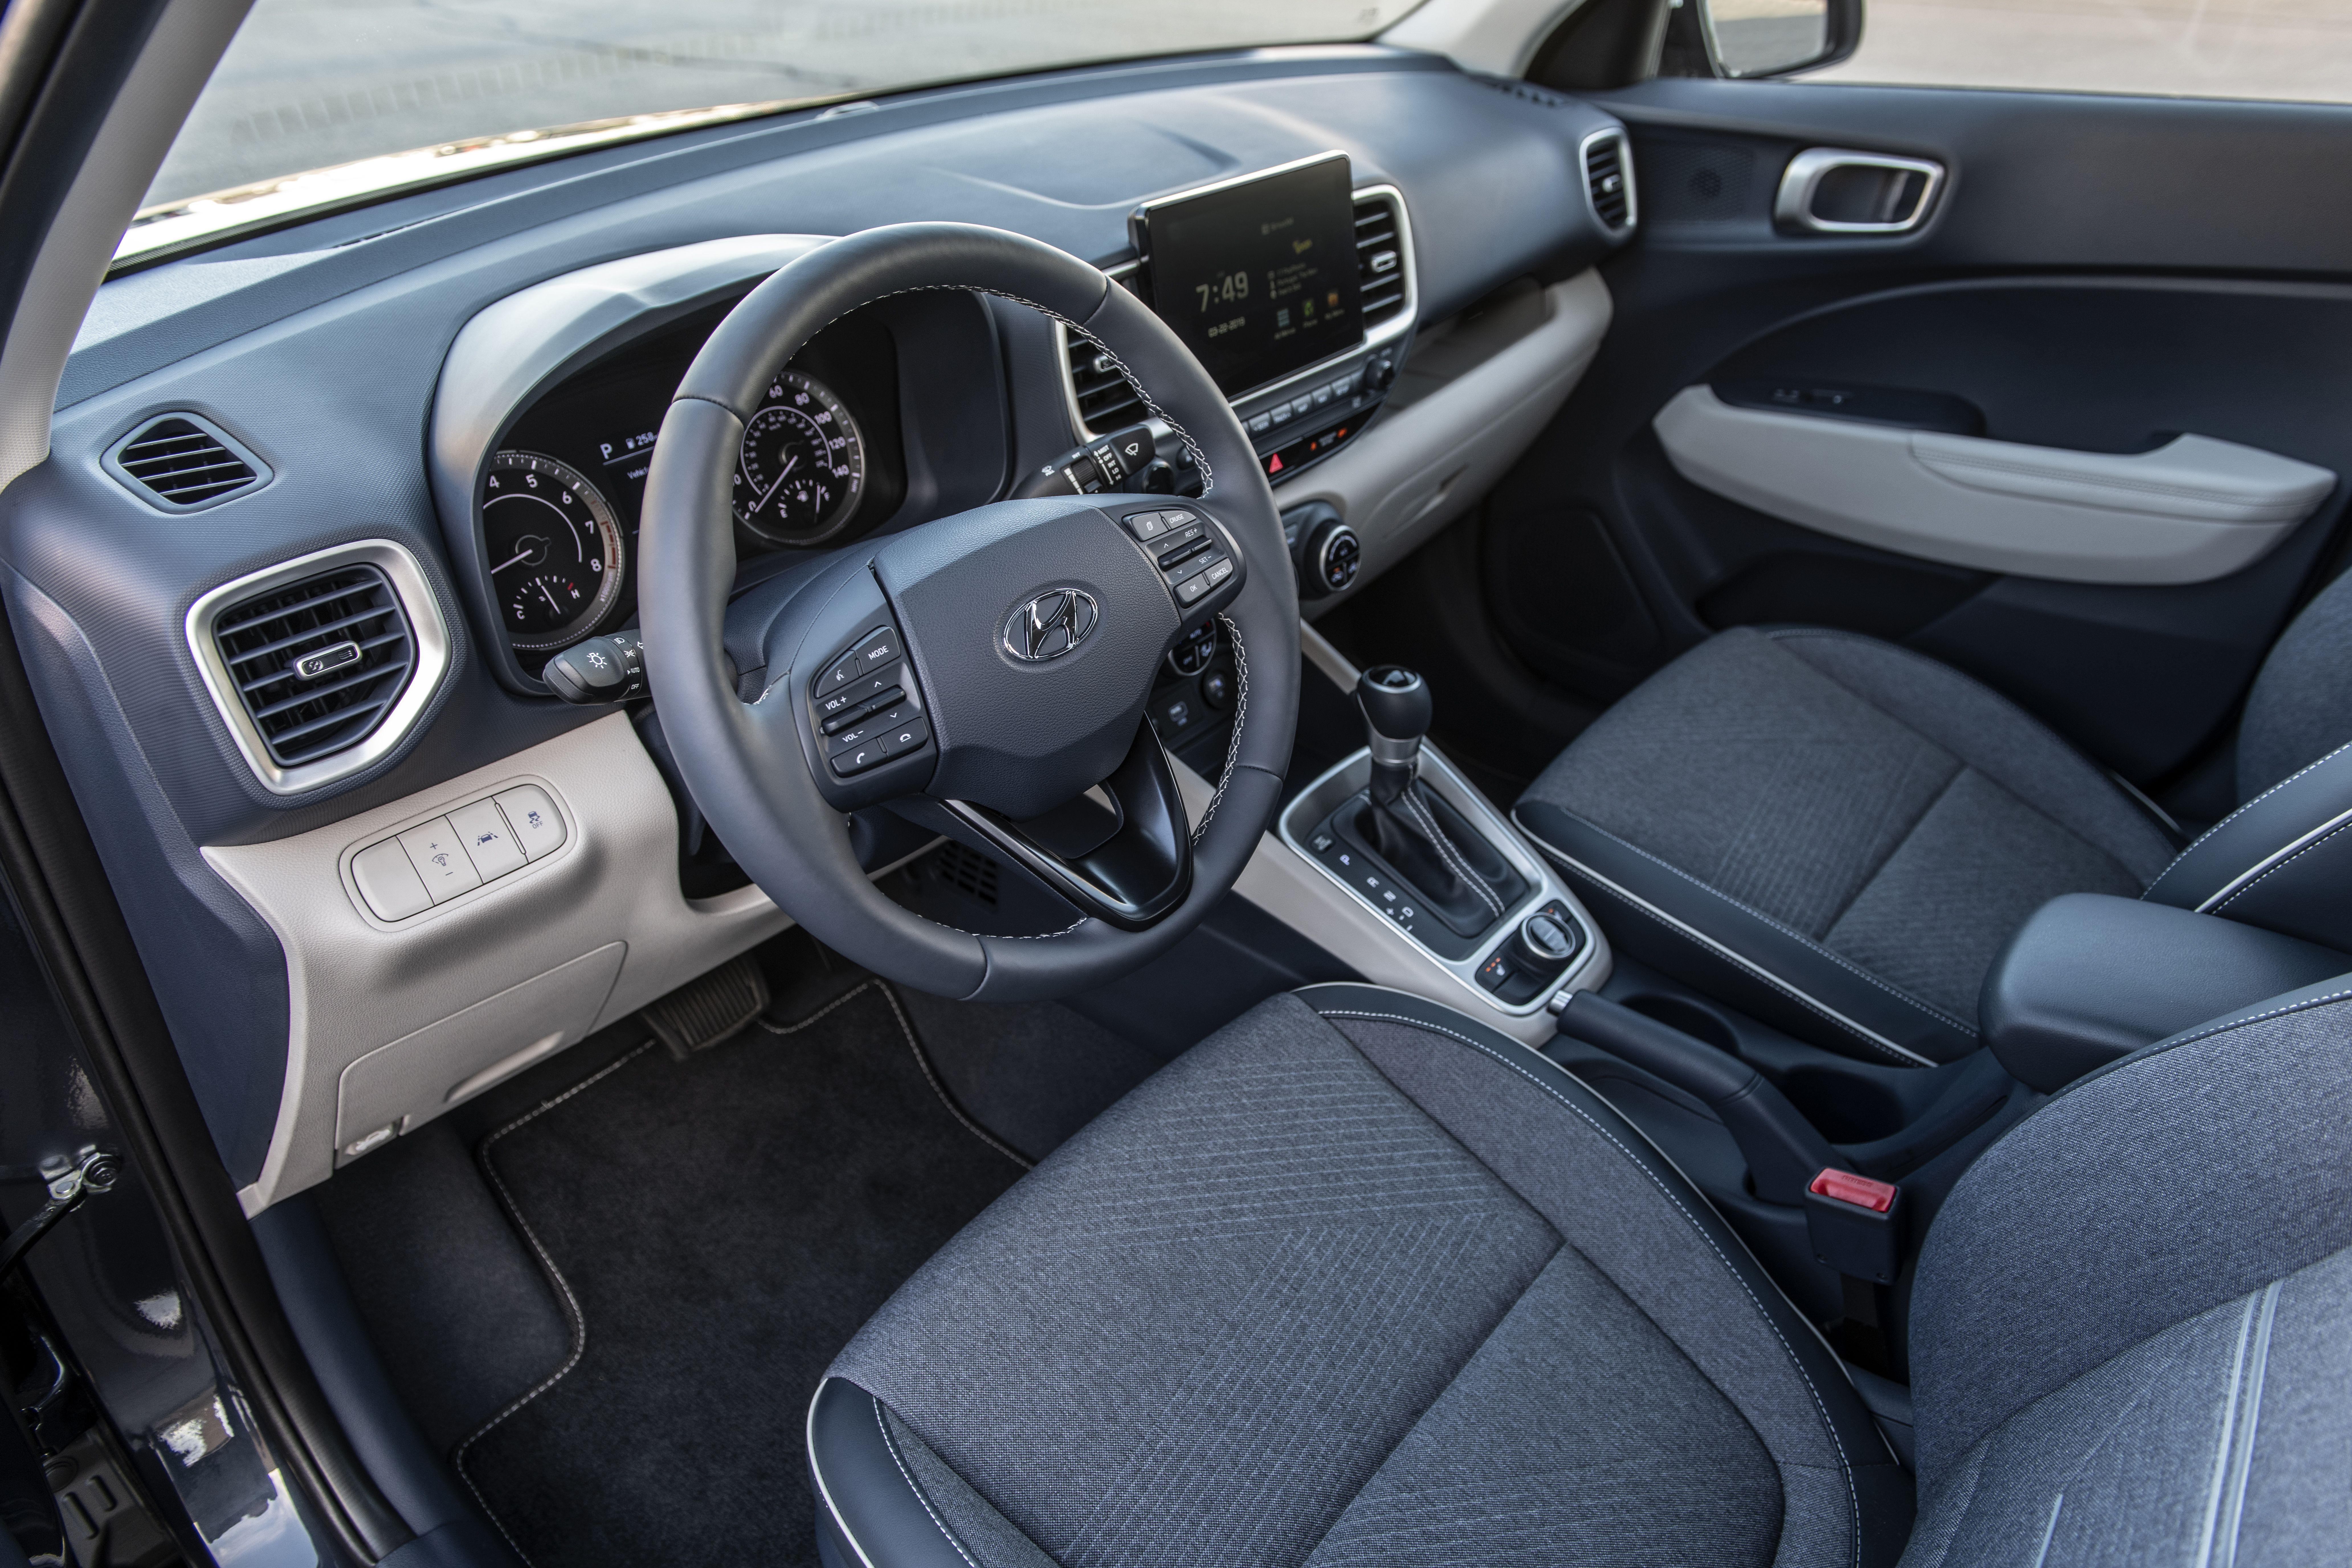 2020-Hyundai-Venue-Interior jpg | Hyundai Venue Forum